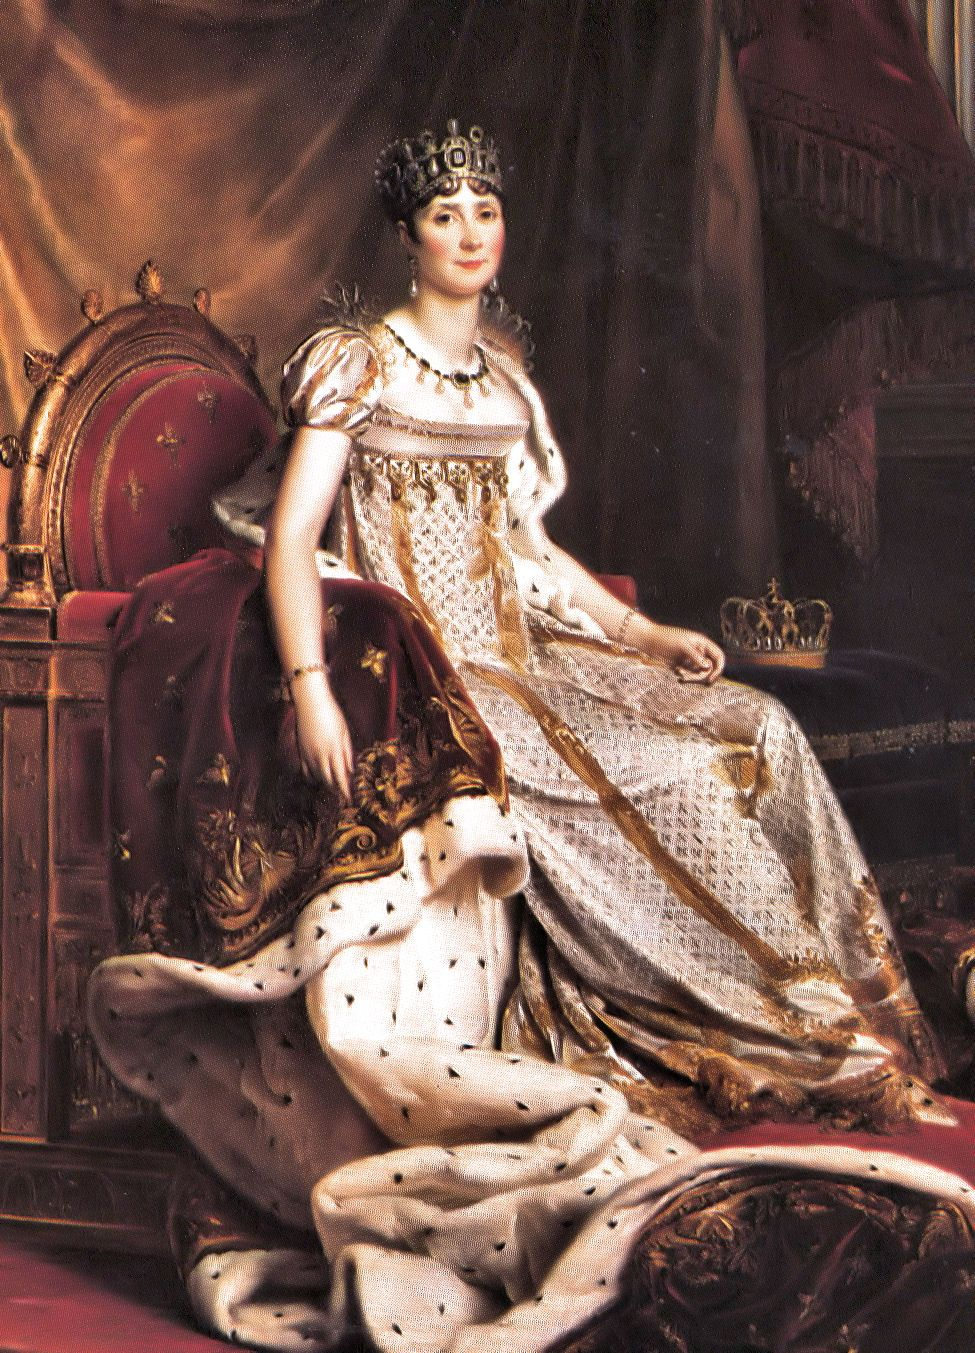 Enchanted by Josephine - ART & HISTORY Salon: PAULINE AND ... Josephine S